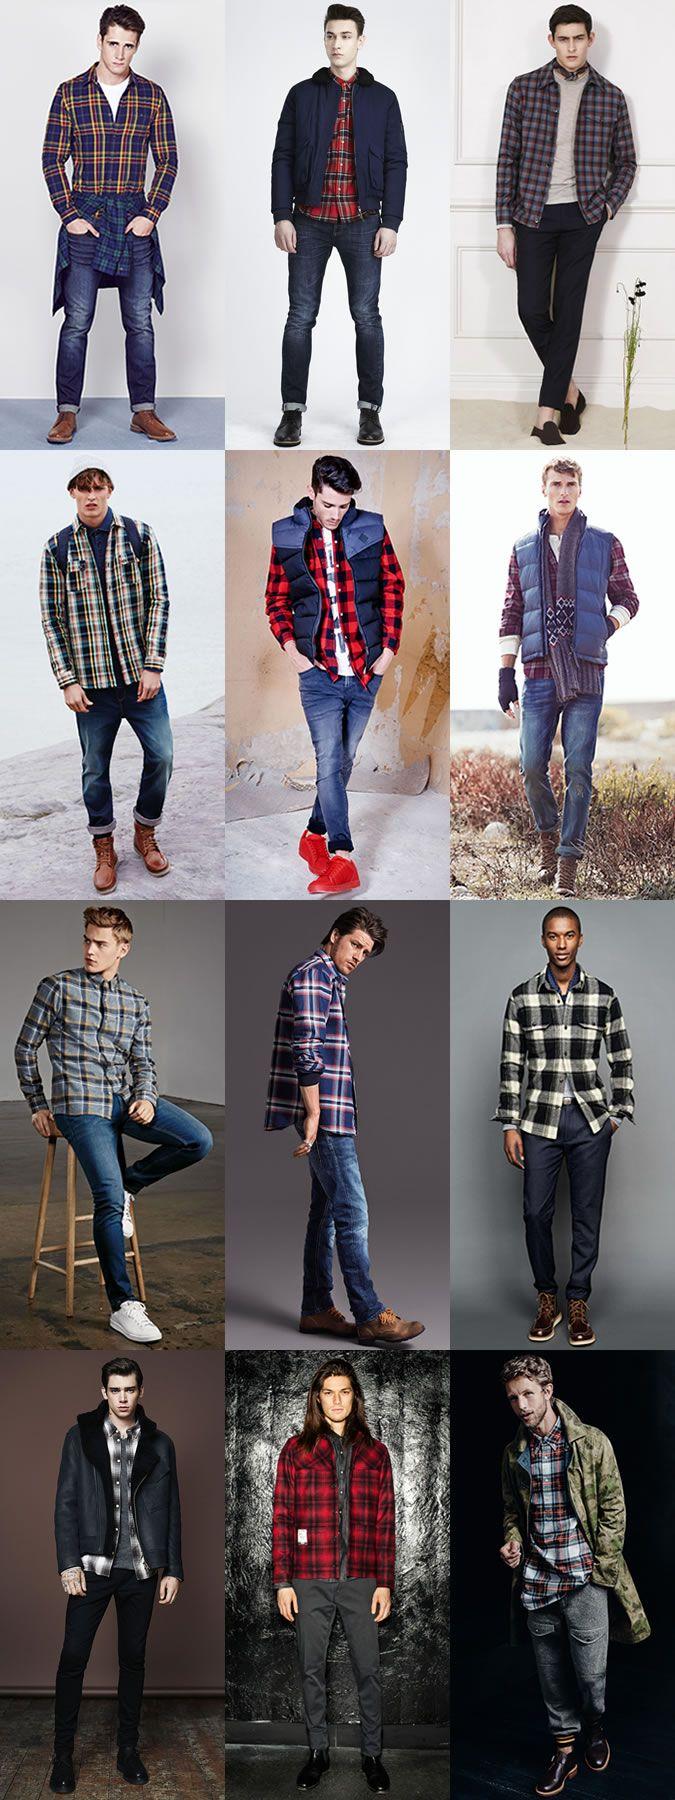 Men's Autumn Wardrobe Essentials: Flannel Shirt Autumn Outfit Inspiration Lookbook